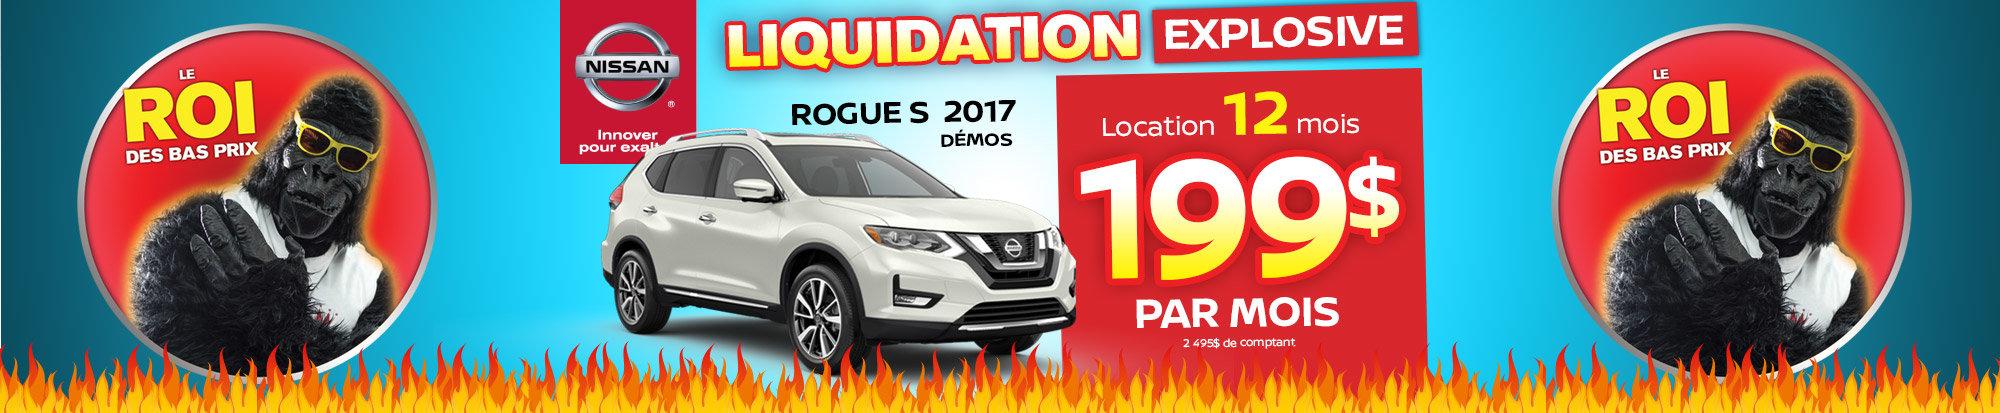 Méga liquidation Rogue demo 2017 web